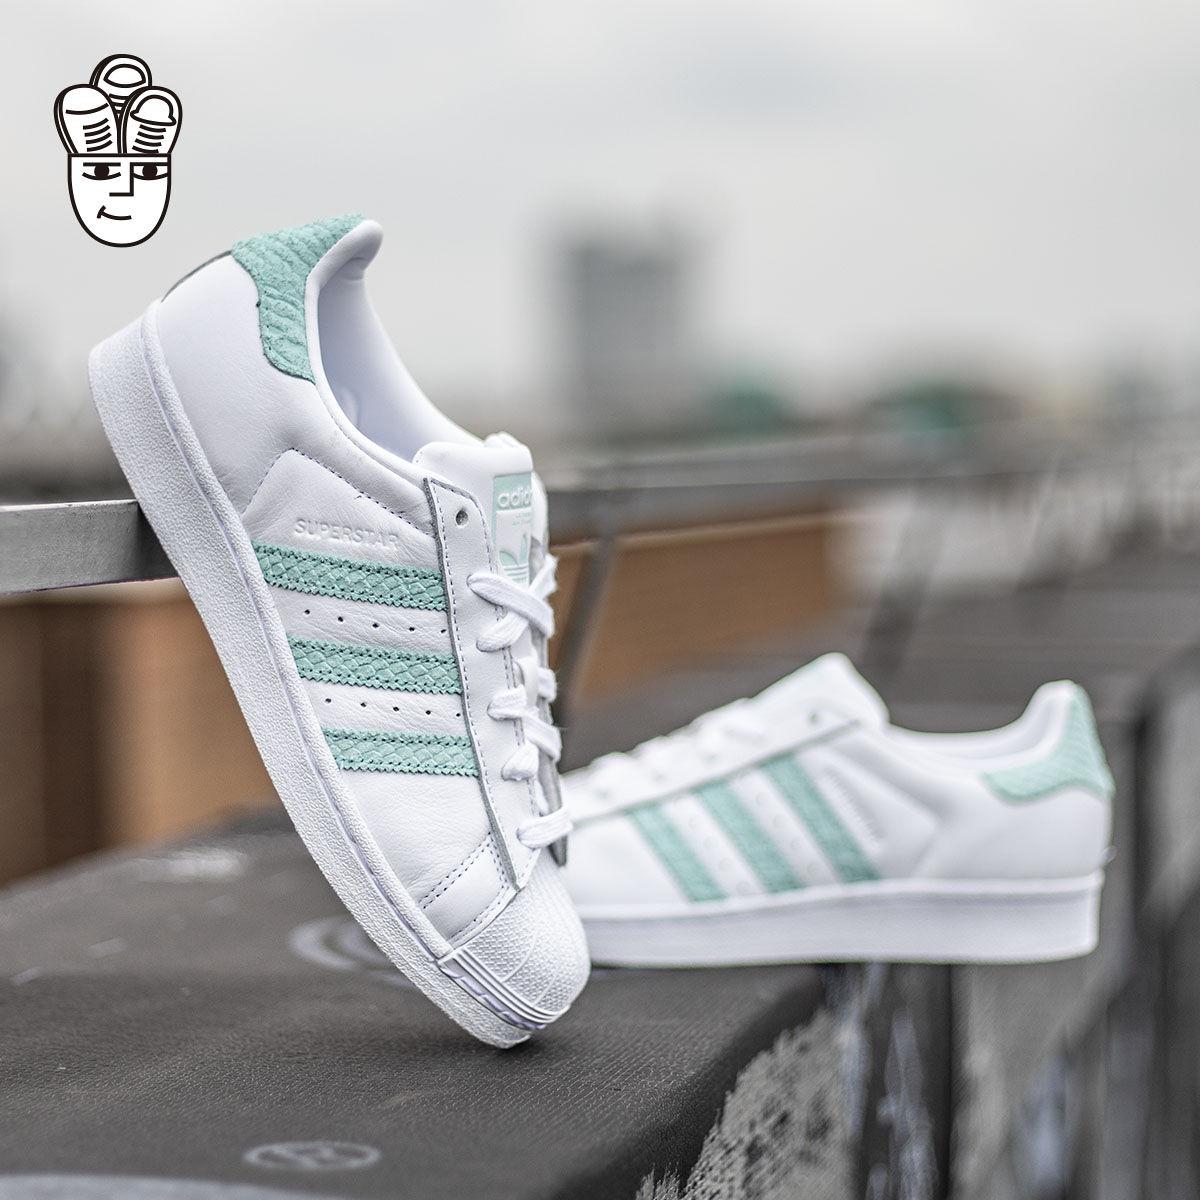 Adidas Superstar W 三叶草女鞋 贝壳头板鞋 运动休闲鞋